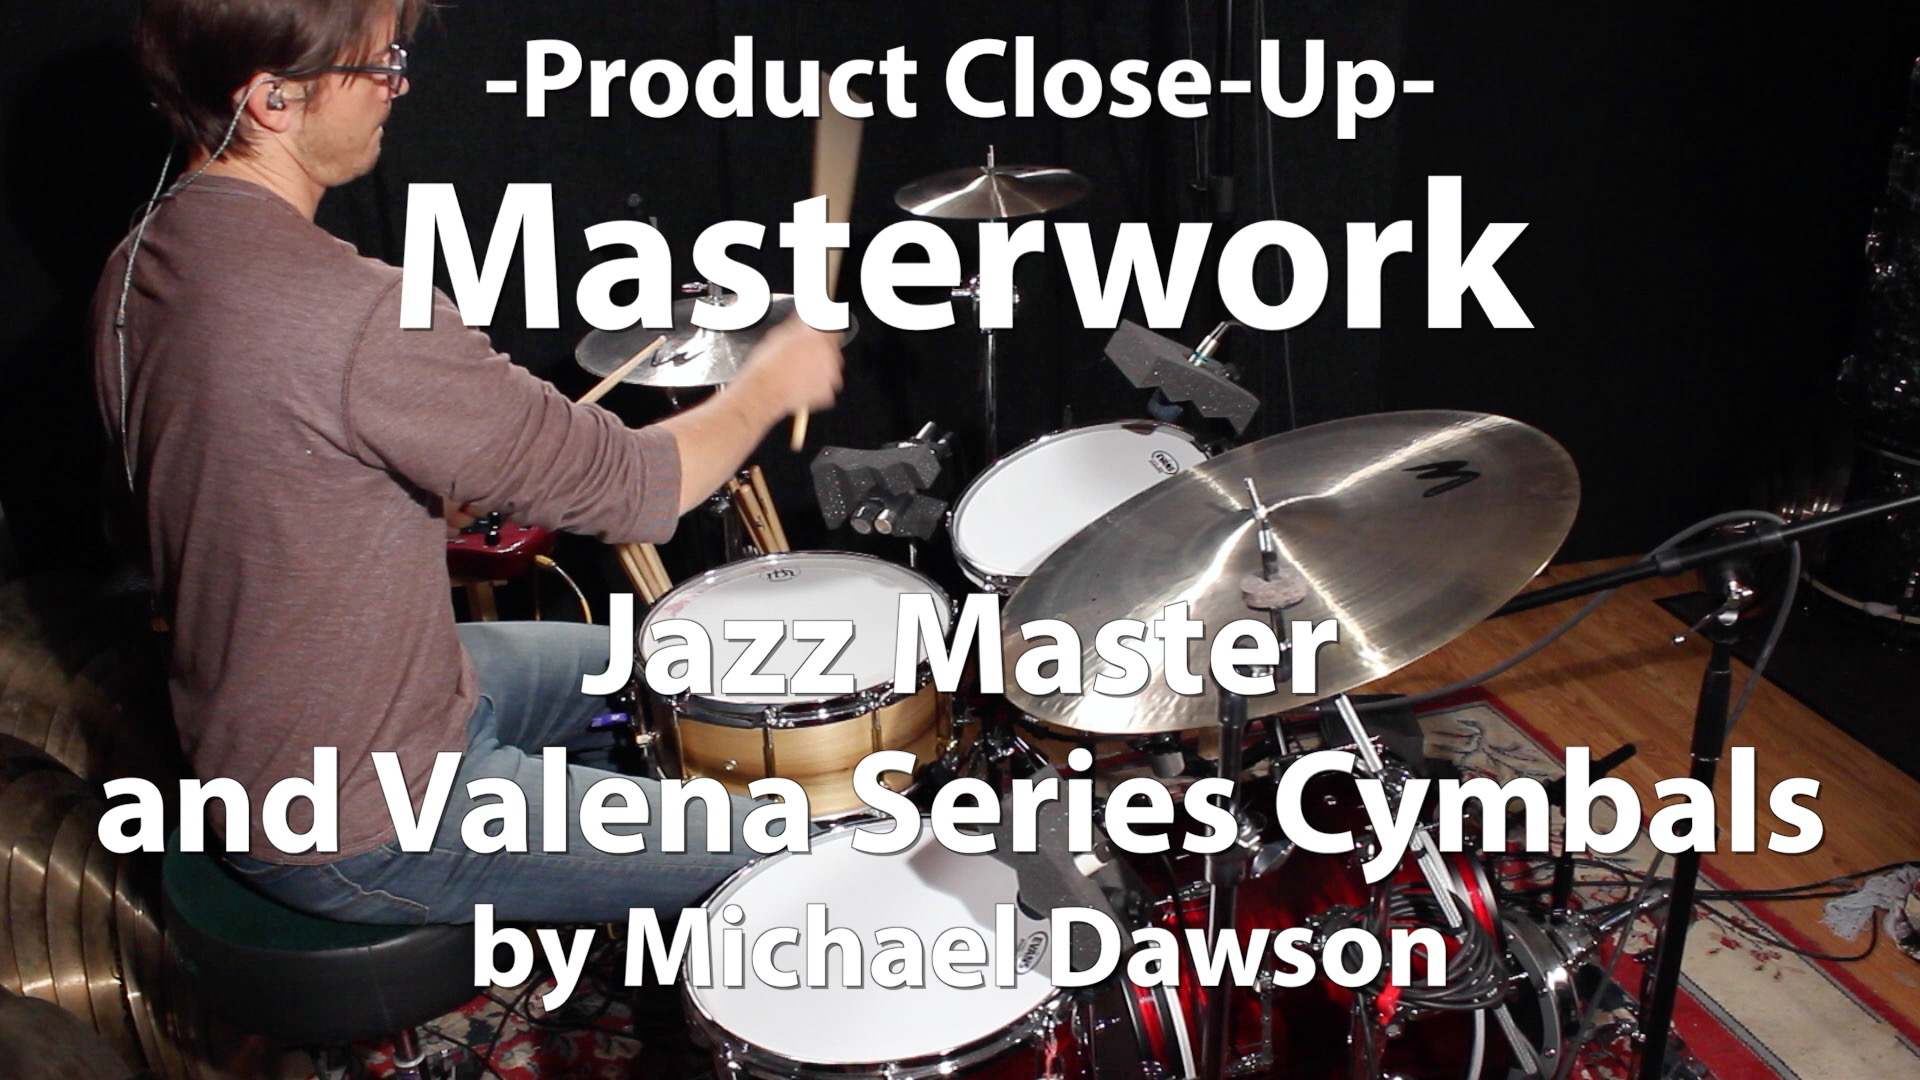 Video Demo! Masterwork - Jazz Master and Valena Series Cymbals